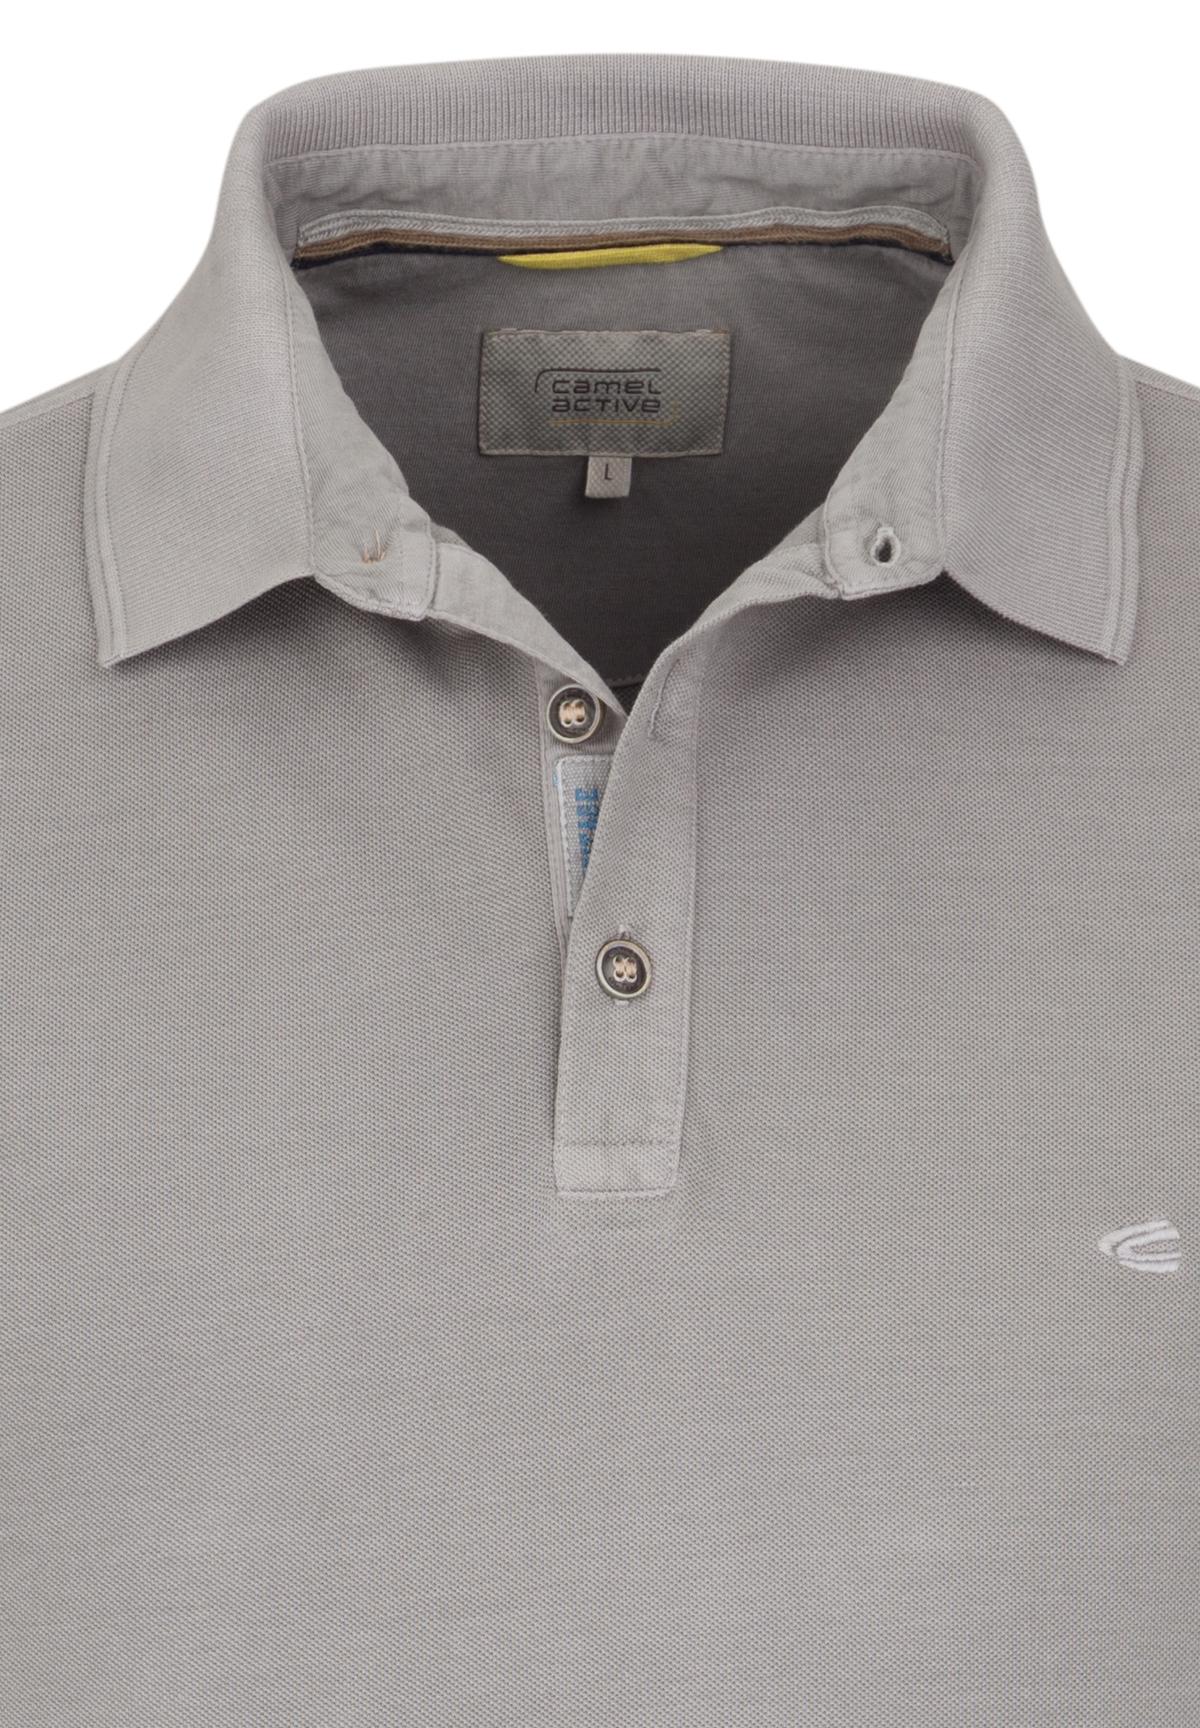 Camel-Active-Herren-Shirt-Poloshirt-Pique-Regular-Fit-NEU Indexbild 40